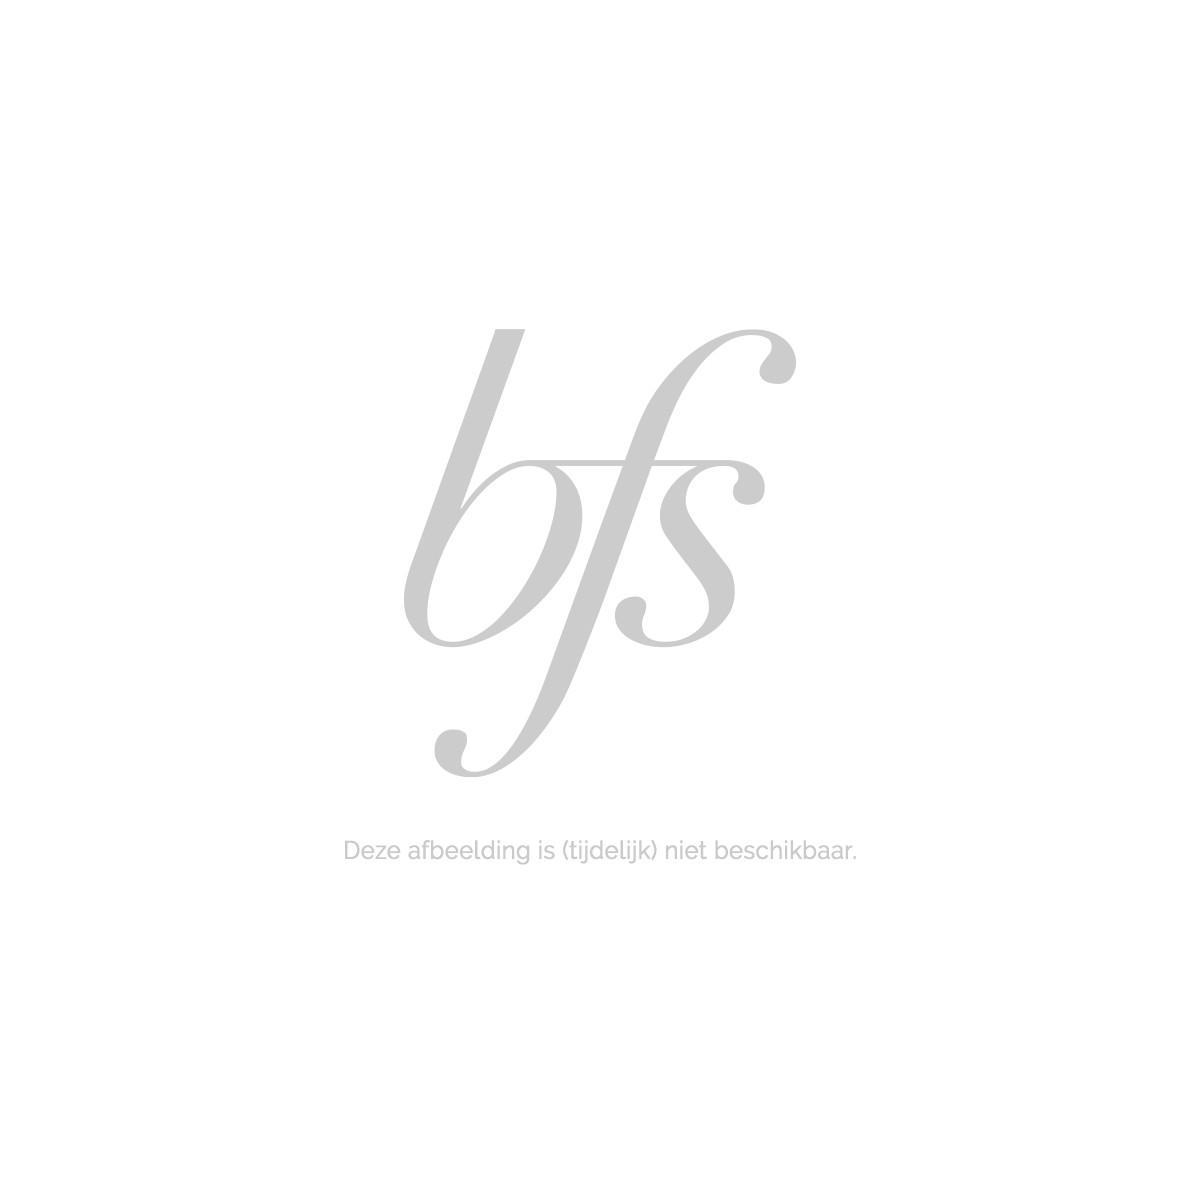 Christian Dior Long-Wear Waterproof Eyeliner Pencil 1,20 Gr